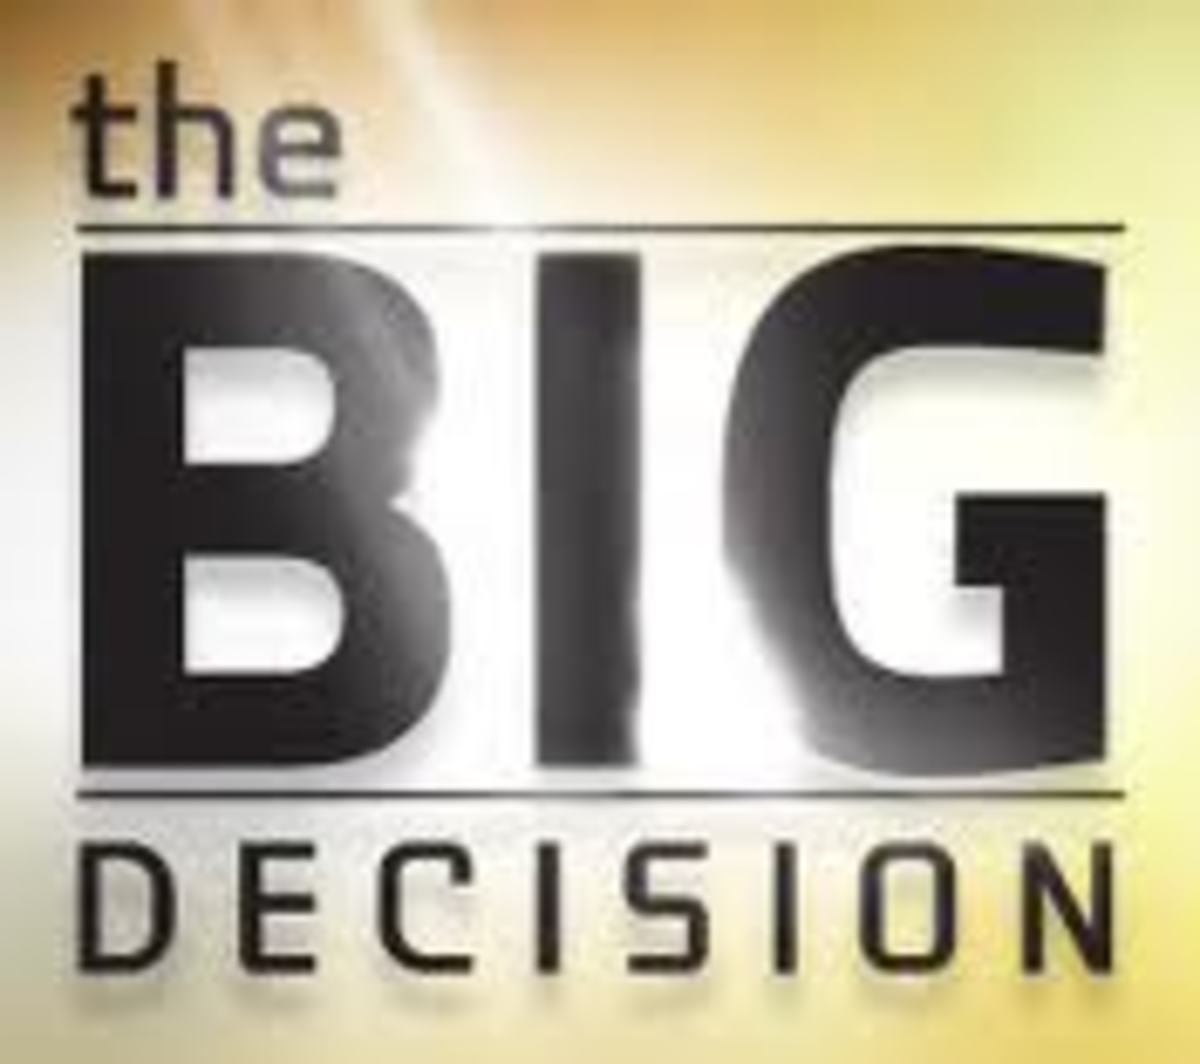 A Decision Making Process: A Decision Matrix for Problem Solving